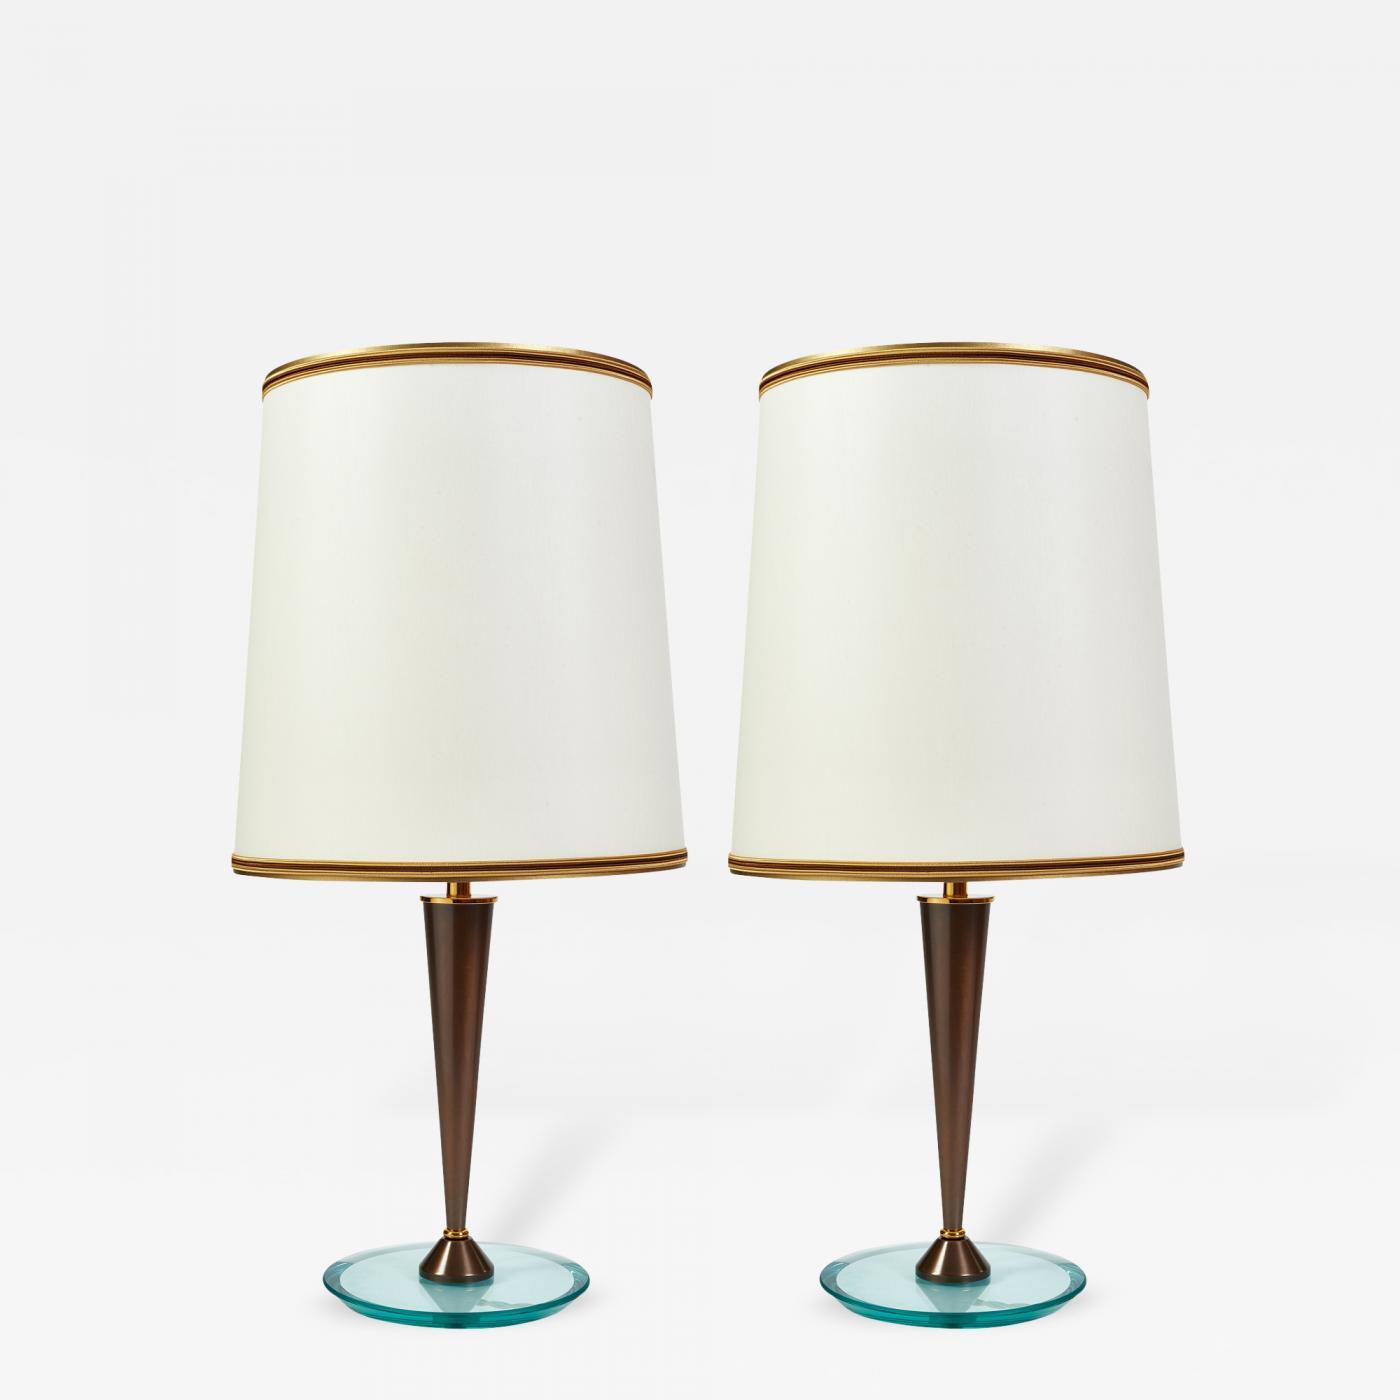 Listings Furniture Lighting Table Lamps